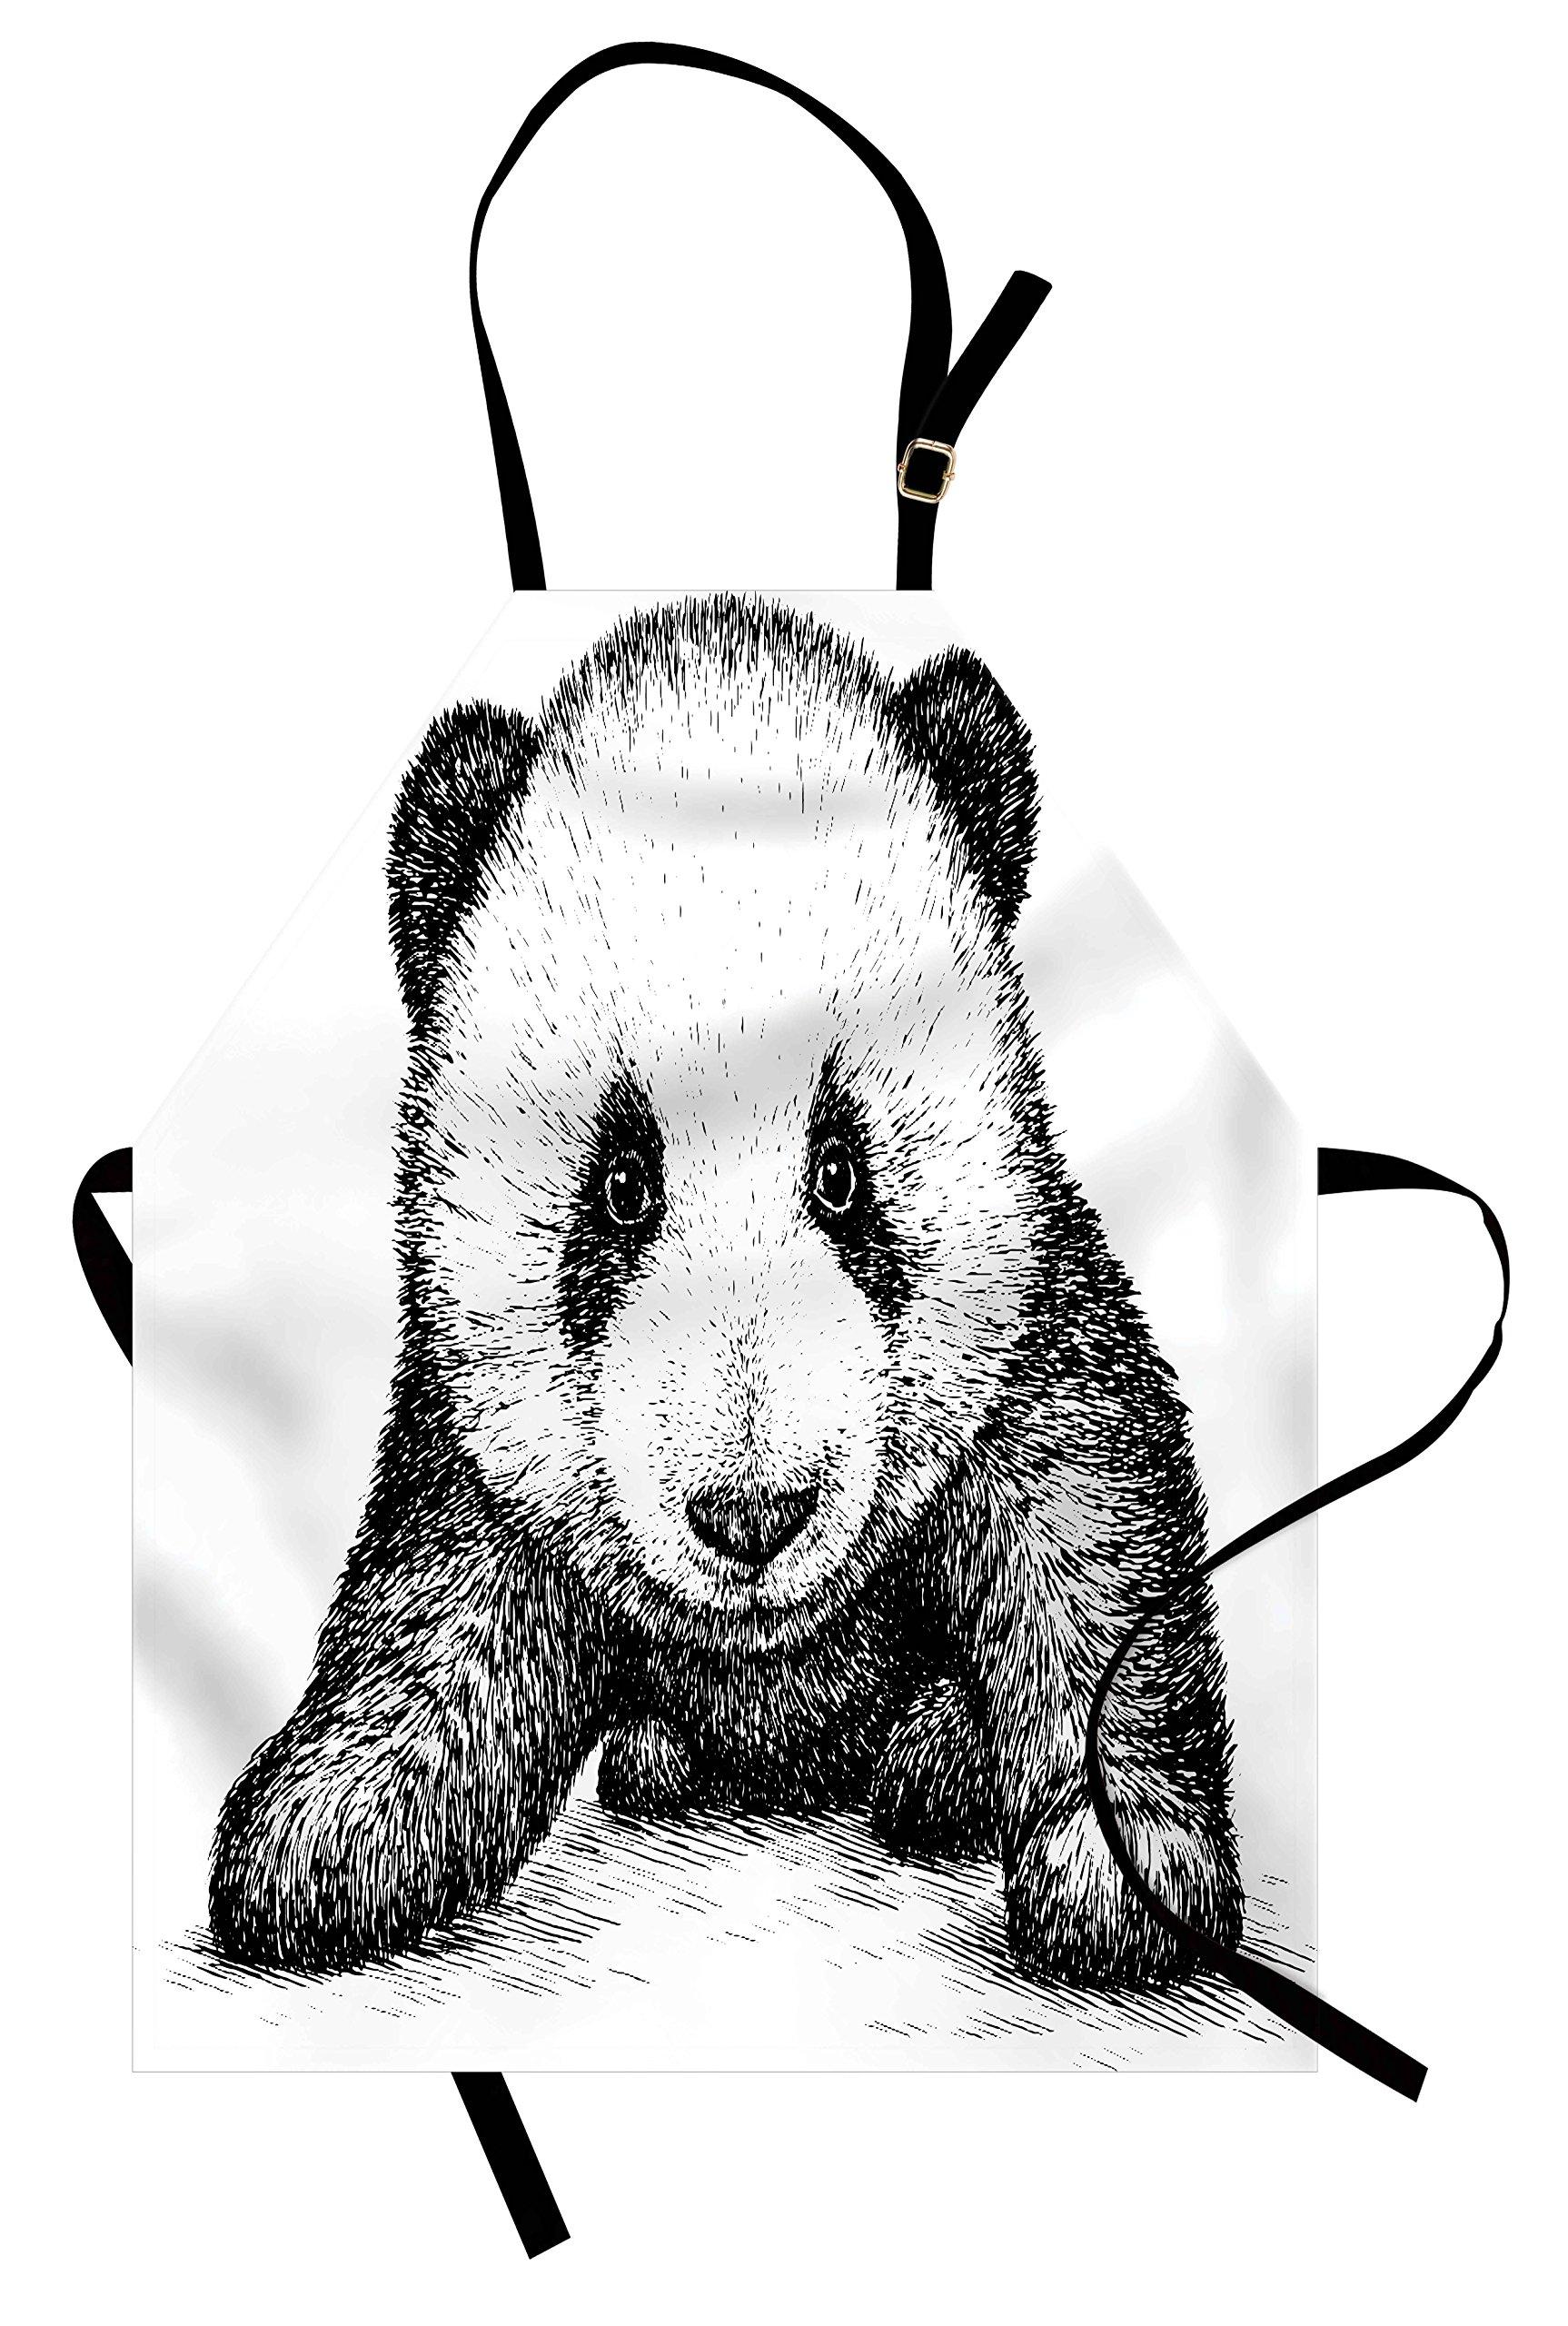 Ambesonne Panda Apron, Baby Panda Bear Illustration Sketch Style Artwork Asian Nature Wild Animals Theme, Unisex Kitchen Bib Apron with Adjustable Neck for Cooking Baking Gardening, Black White by Ambesonne